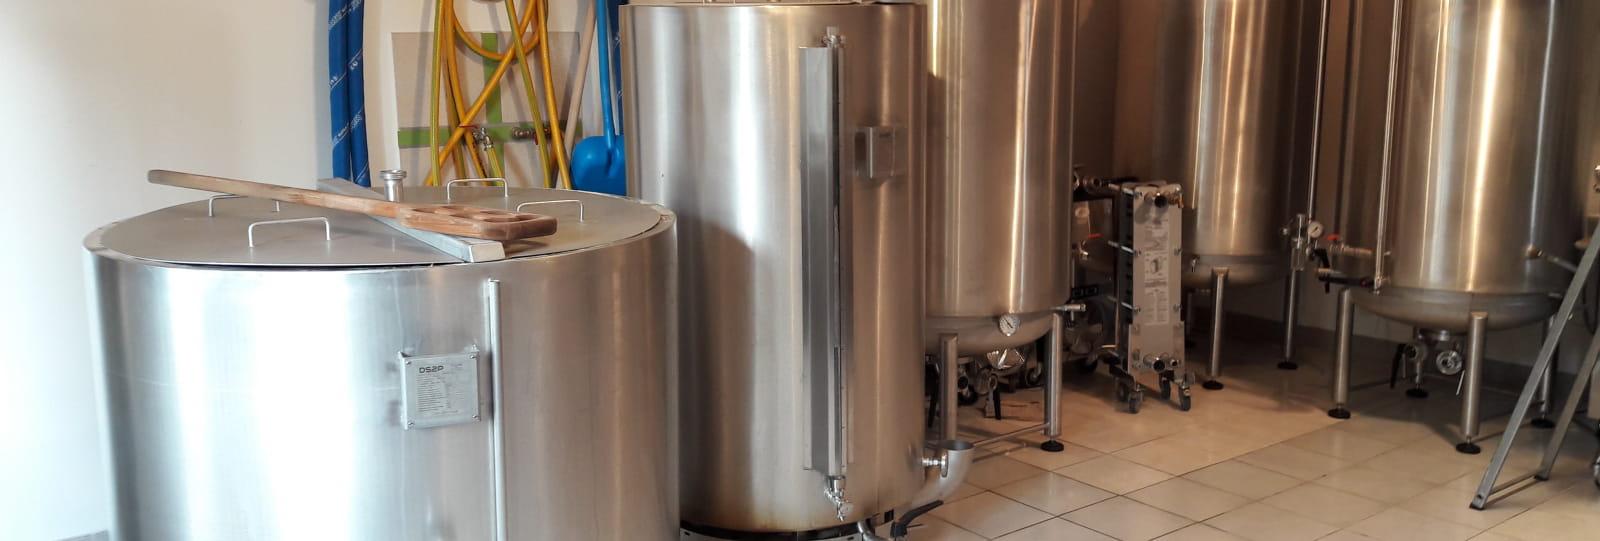 Brasserie CABULE - Bières artisanales